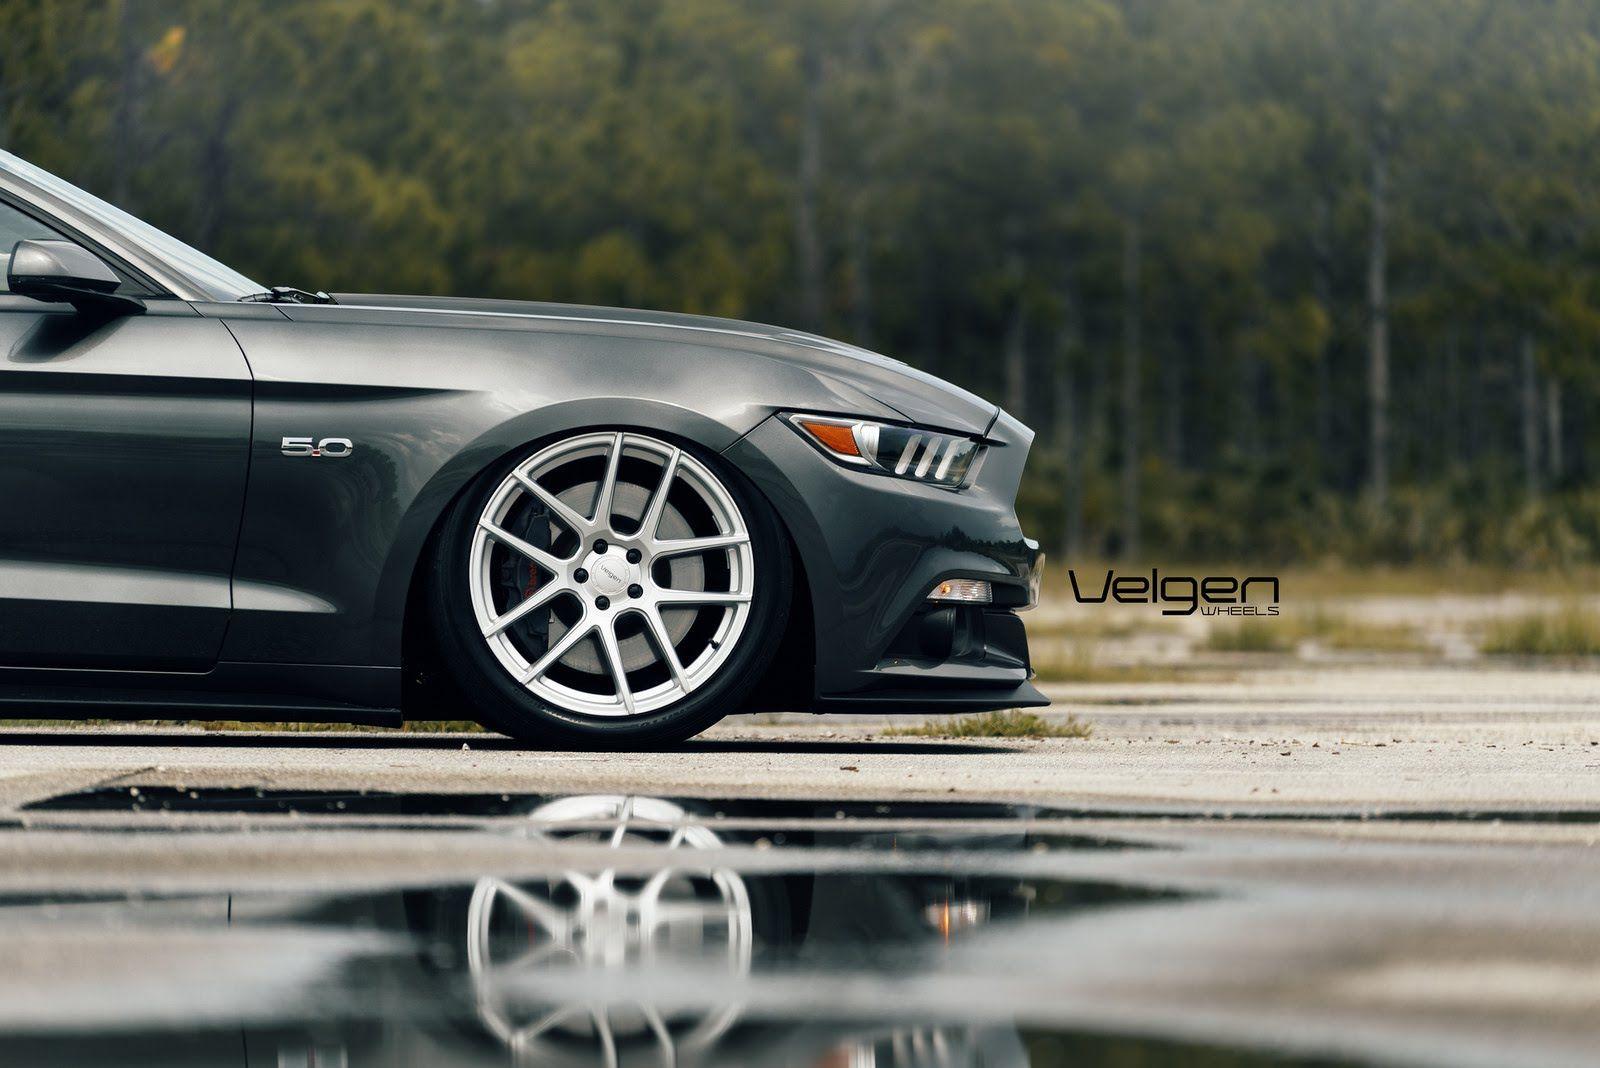 Bagged 2015 Mustang GT on Velgen Wheels Inspiration